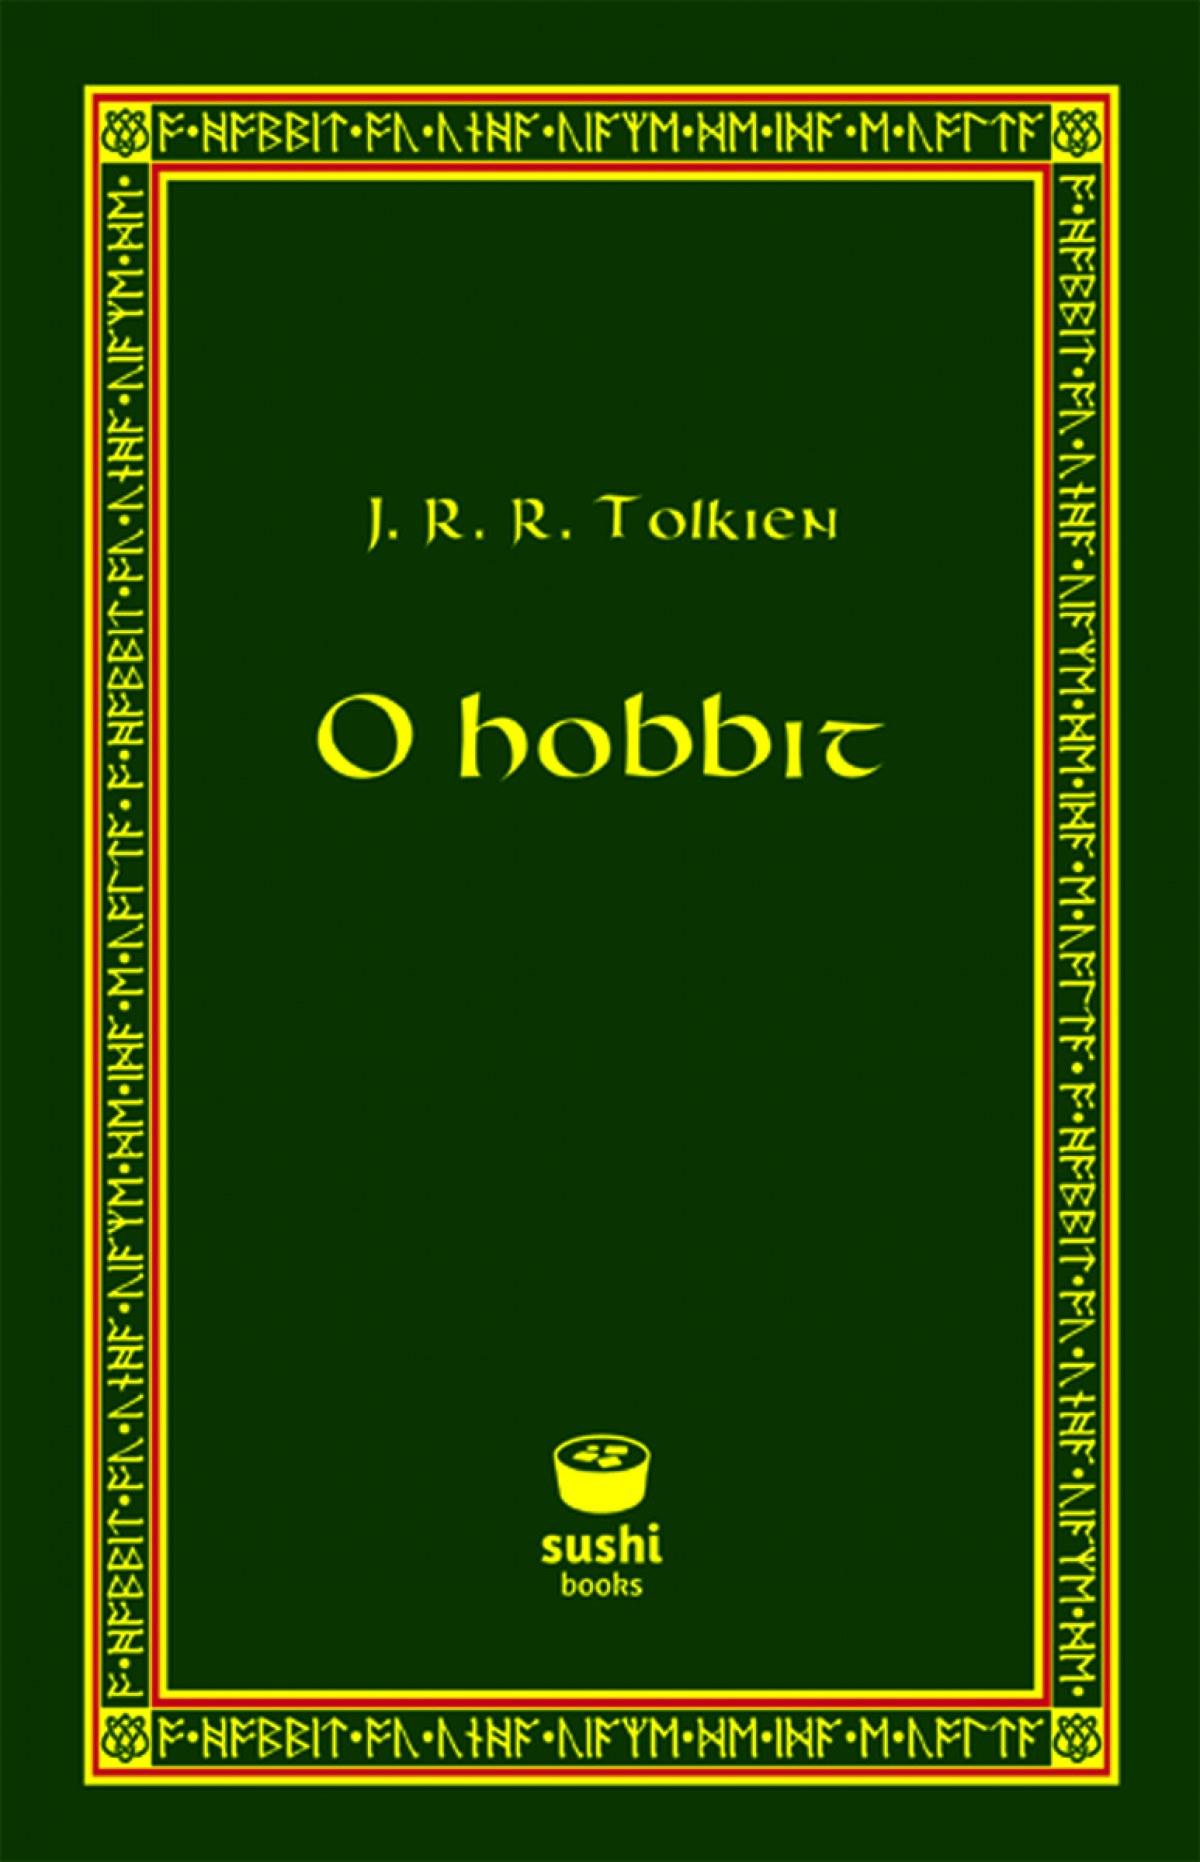 O HOBBIT 9788416884117